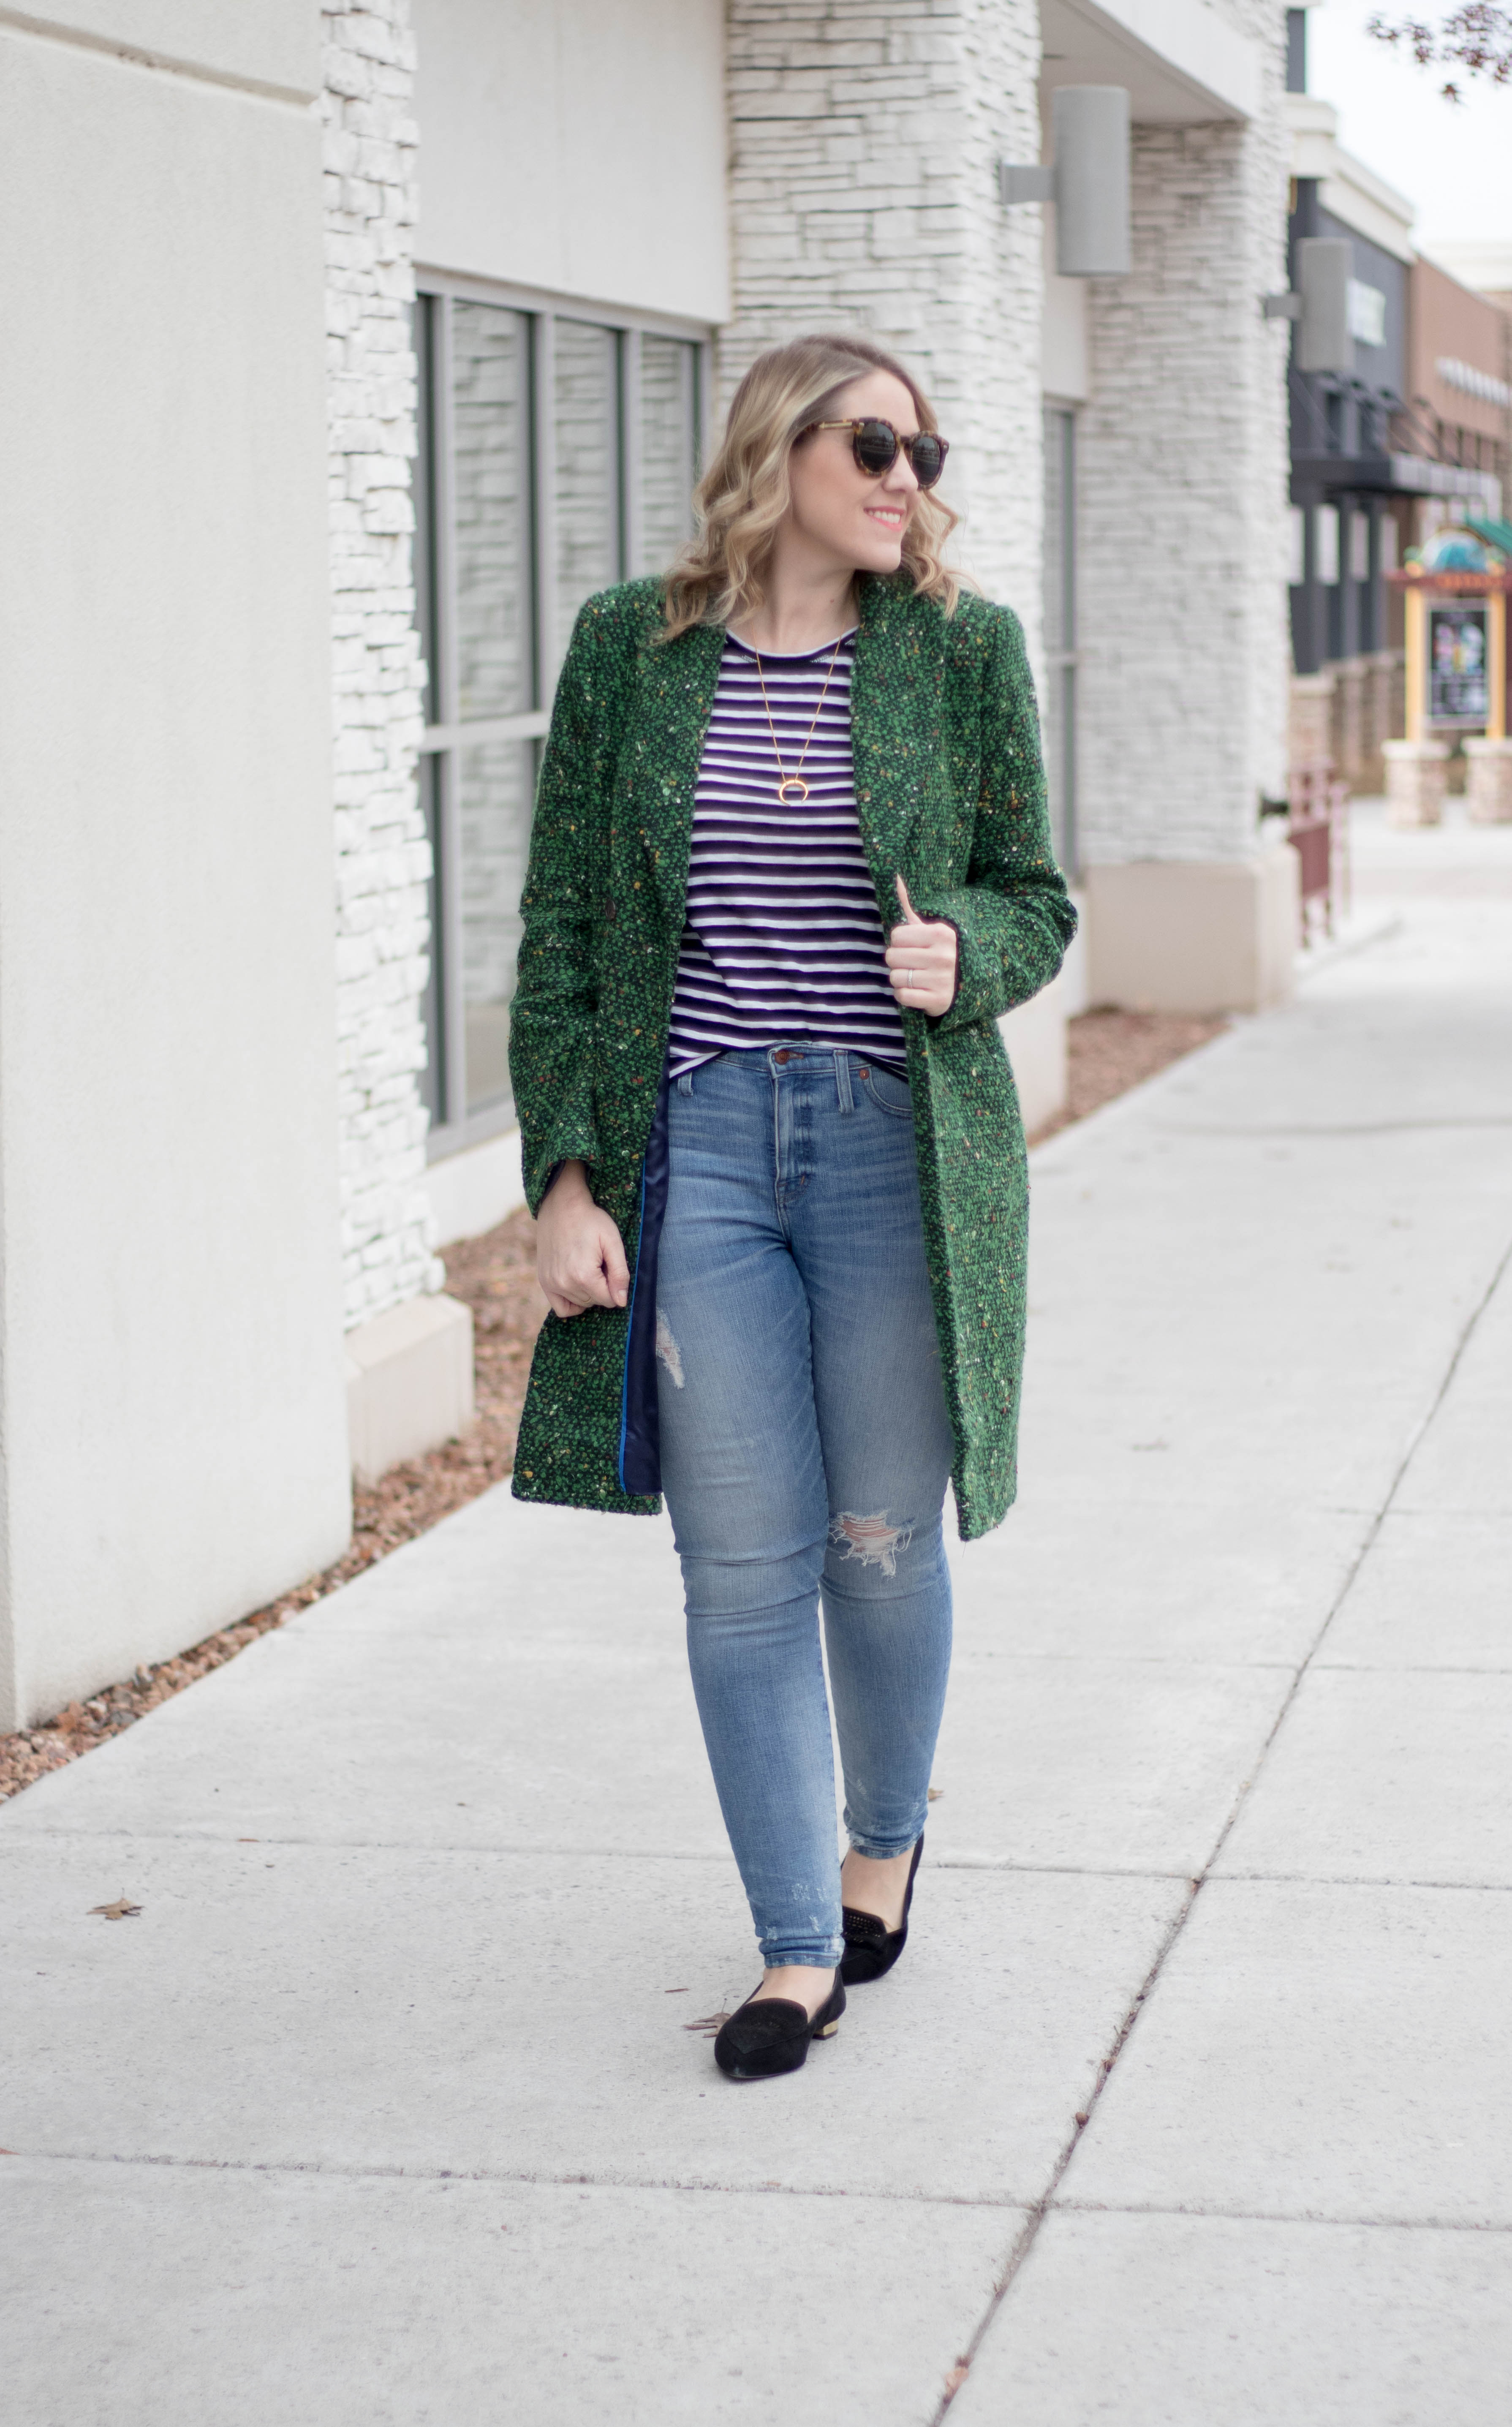 jcrew Daphne tweed coat outfit #jcrew #winterstyle #madewell